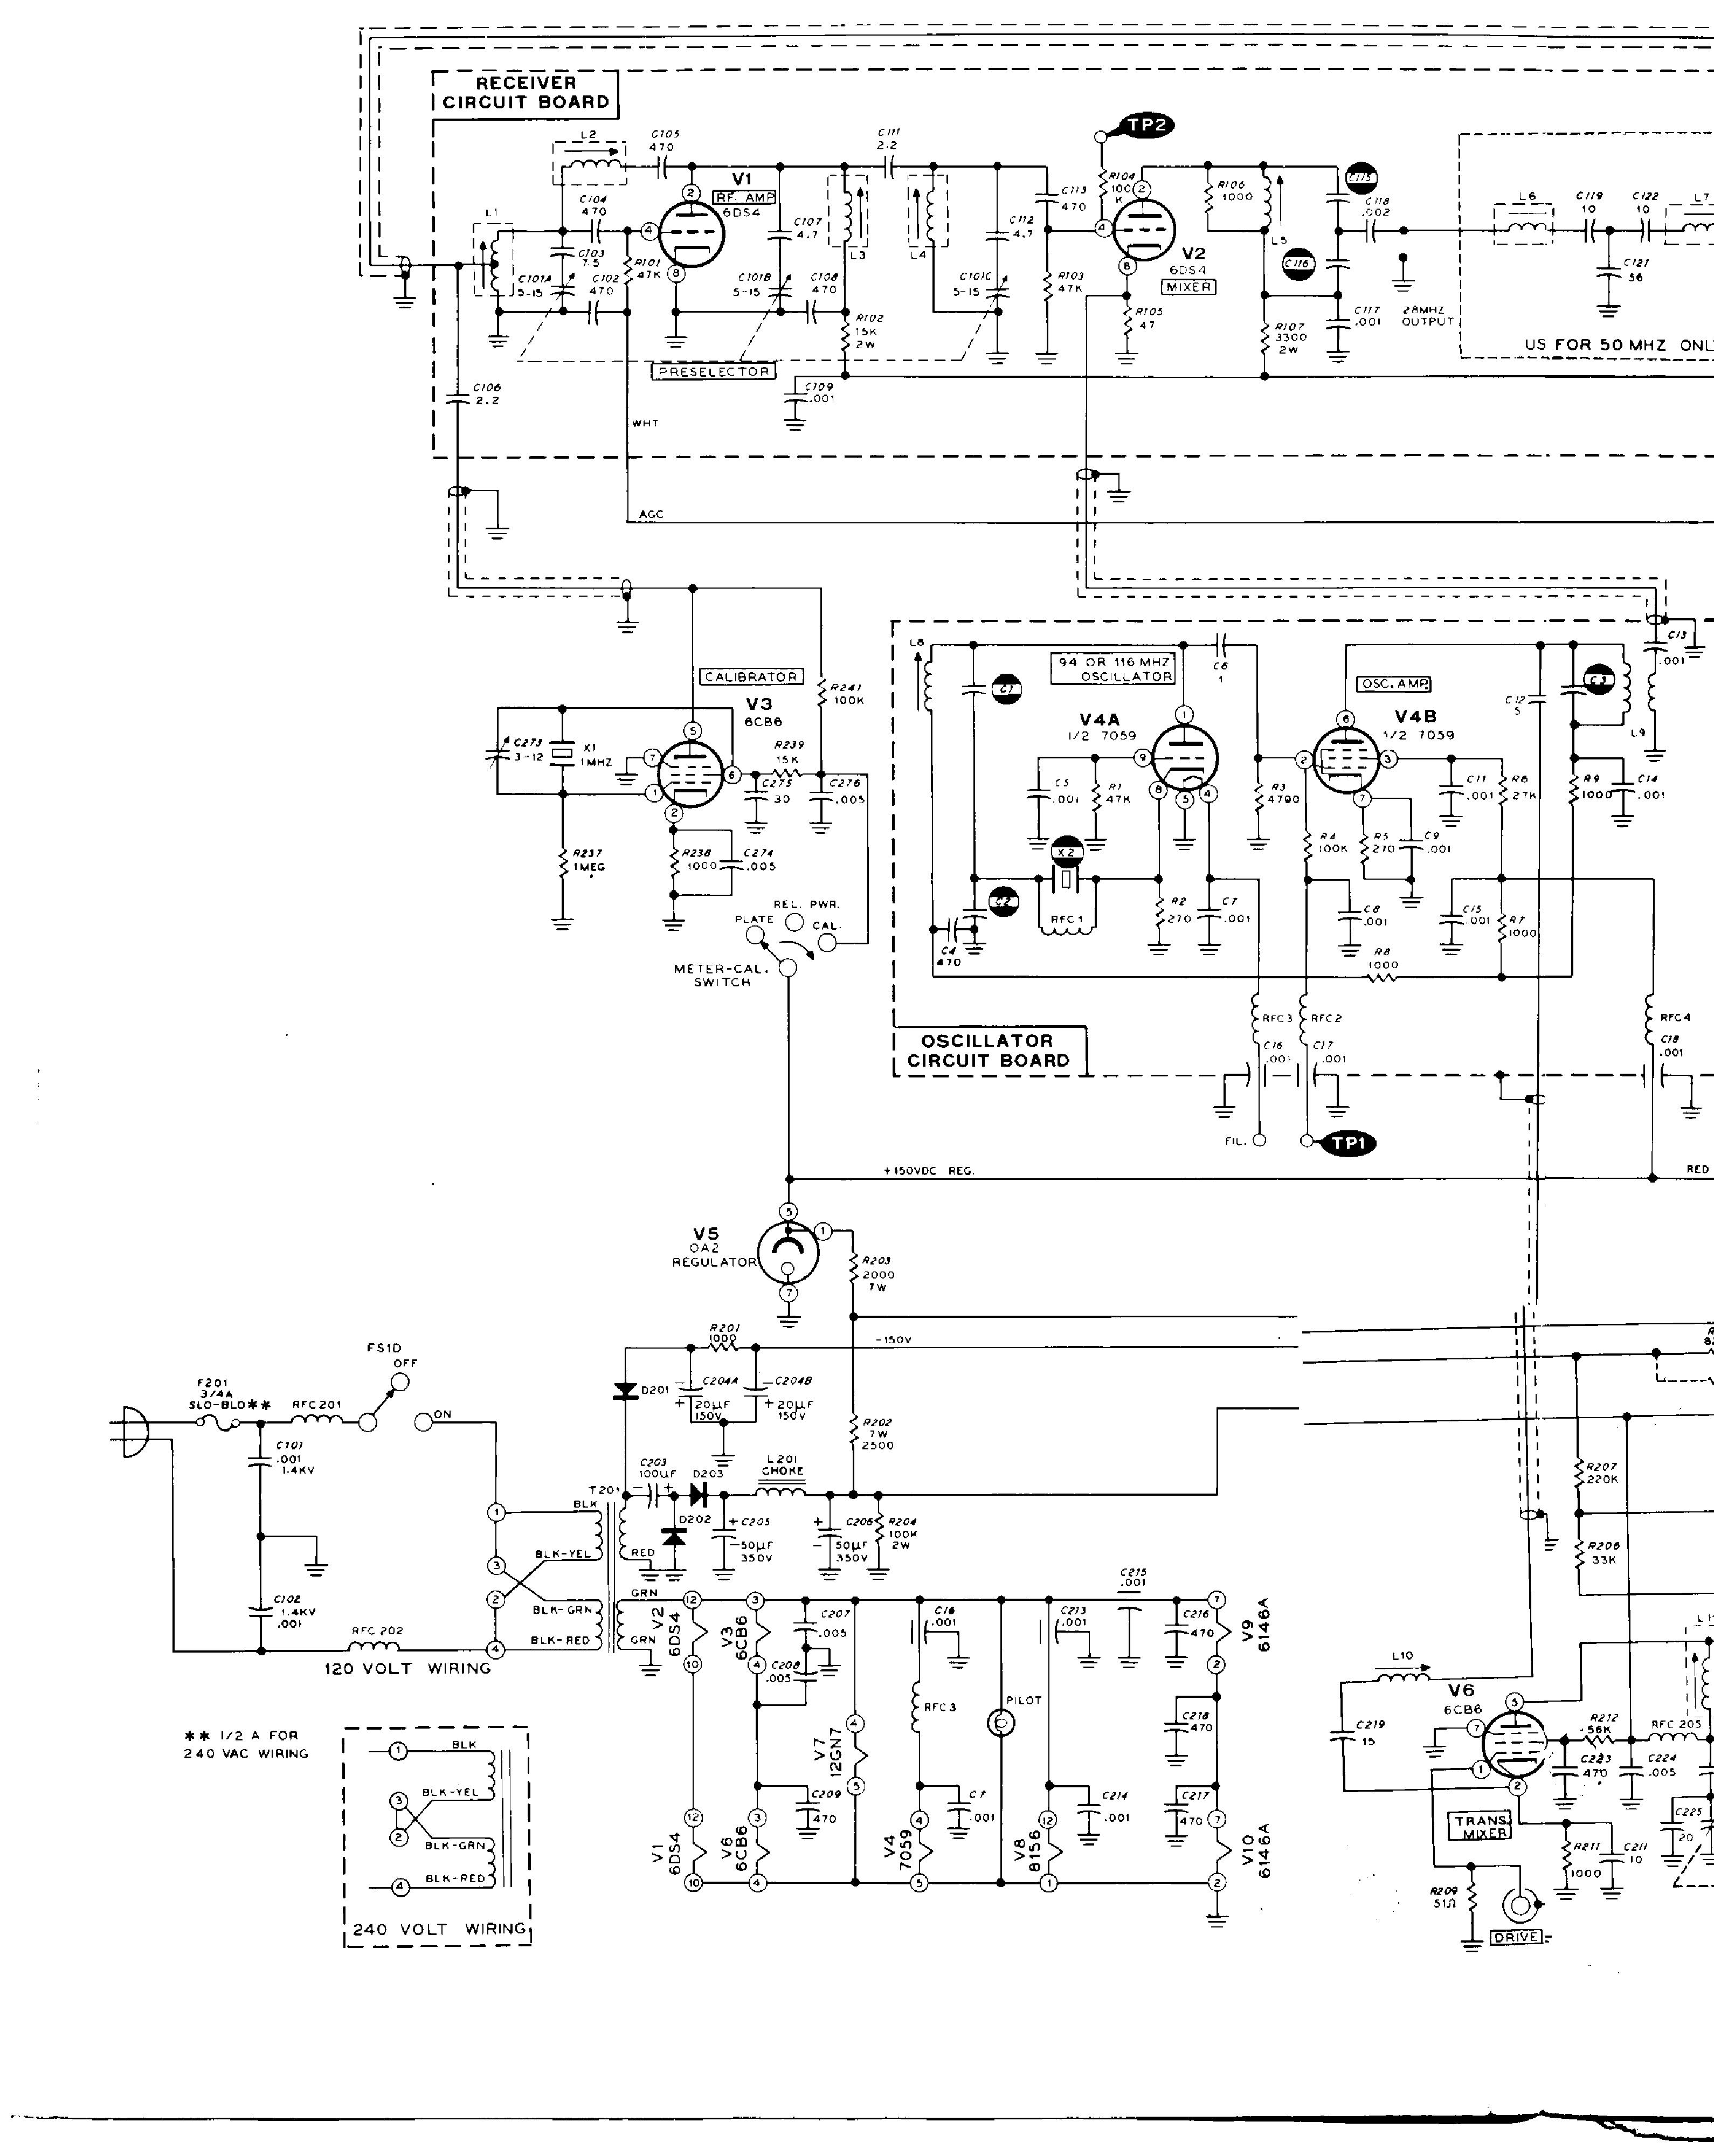 heathkit_sb 500_transverter_sch.pdf_1 heathkit sb 500 transverter sch service manual download heathkit 101 transceiver wiring diagrams at gsmx.co